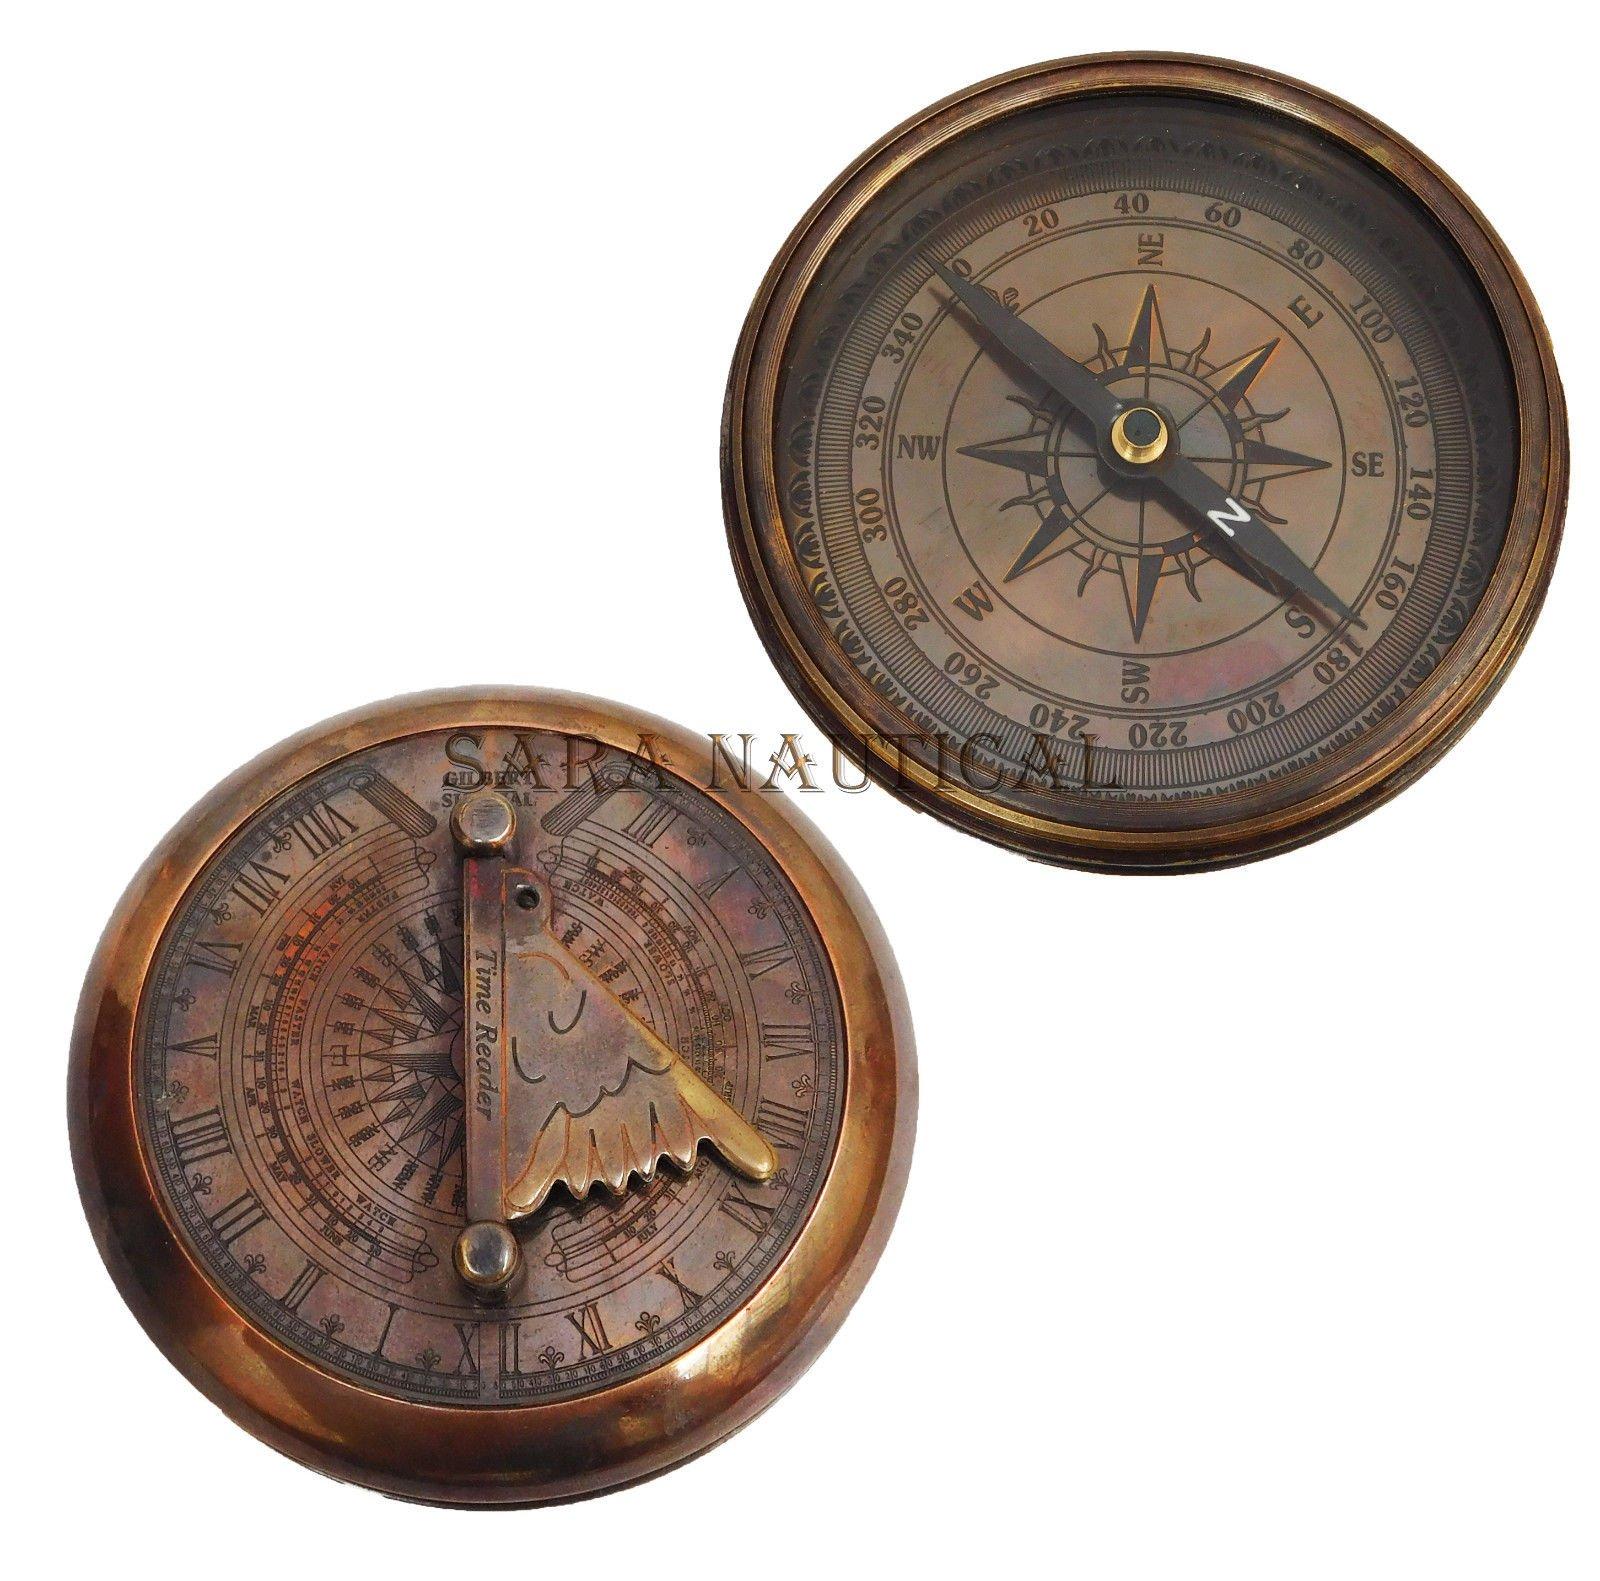 Sara Nautical Nautical Copper Antique Maritime Sundial Compass Gilbert Sundial Vintage Replica